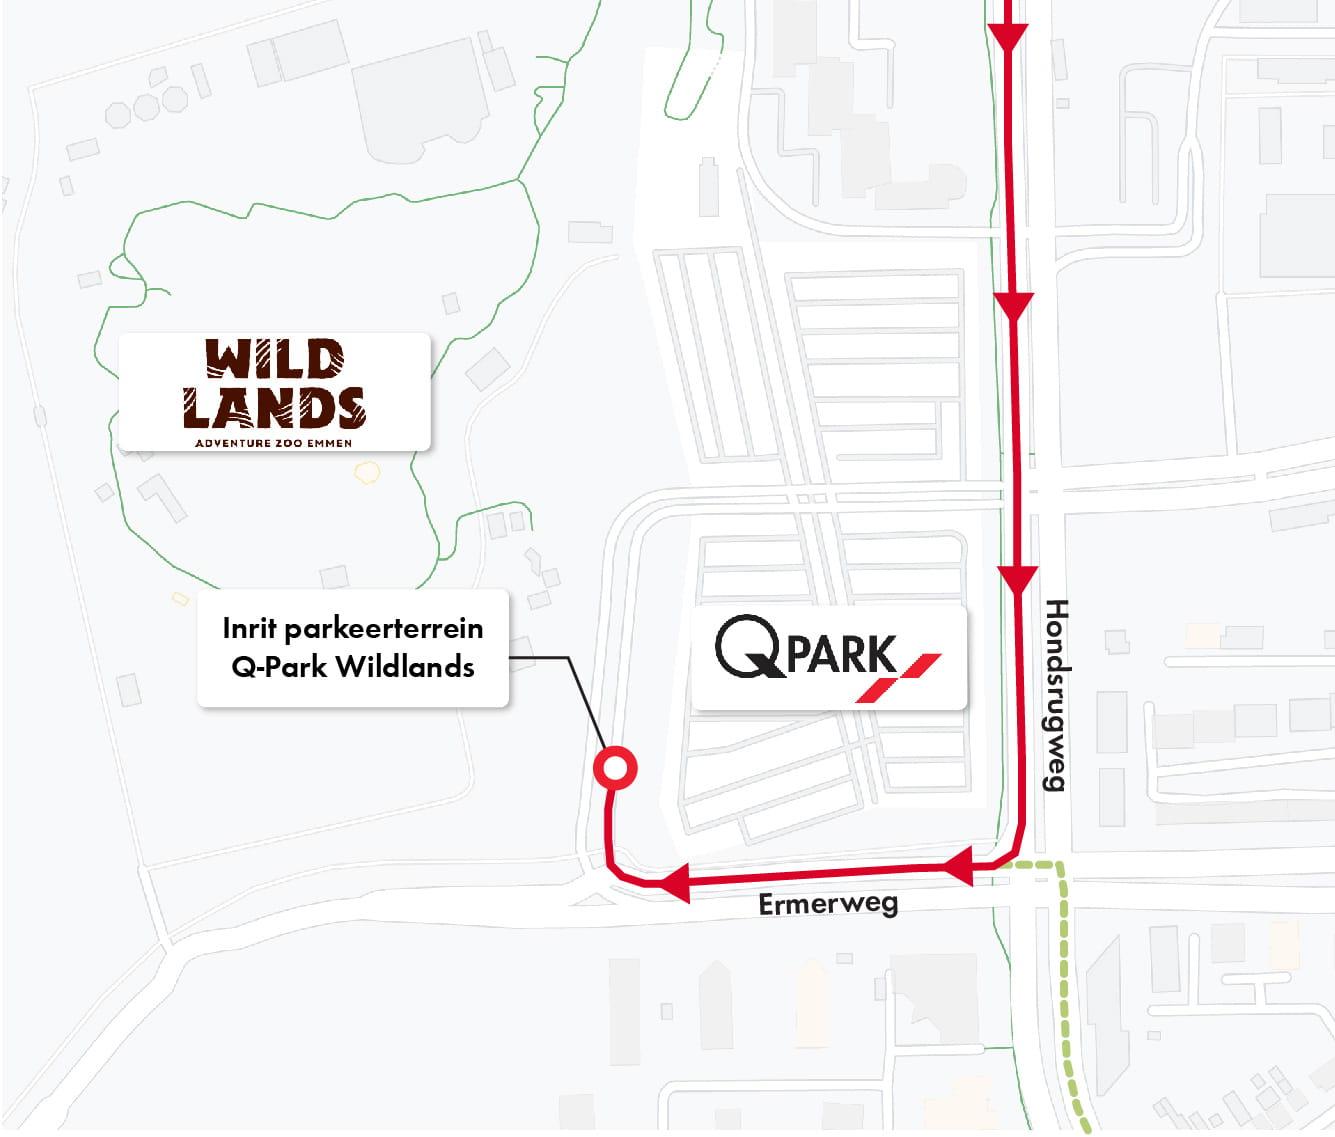 Routebeschrijving Q-Park Wildlands